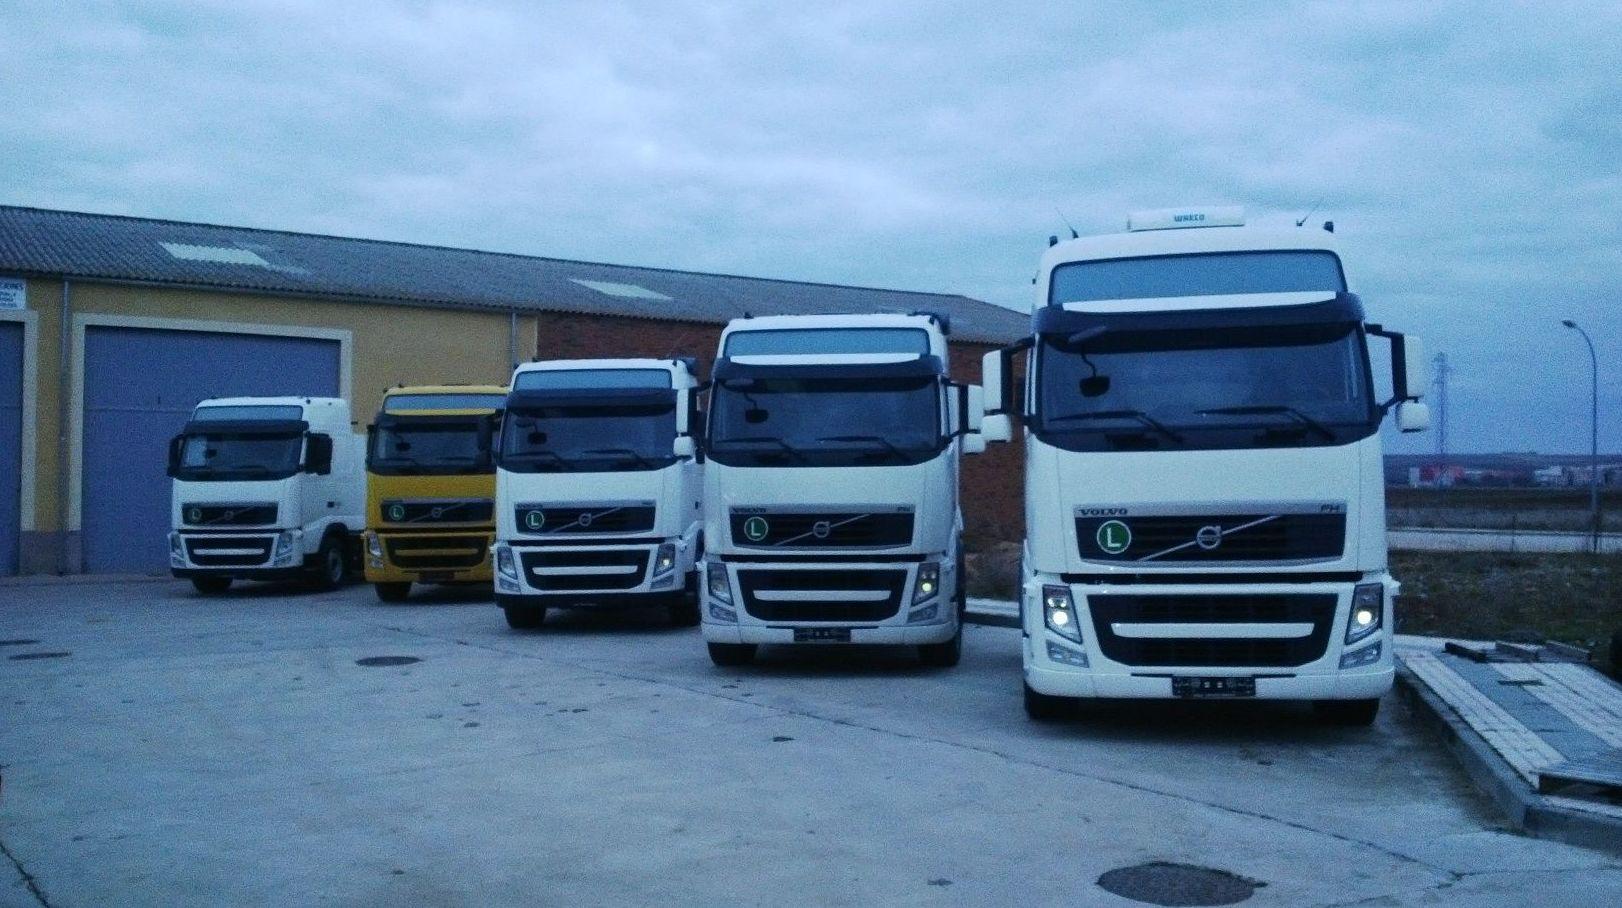 Foto 24 de Camiones en Villares de la Reina | Autotruck Salamanca